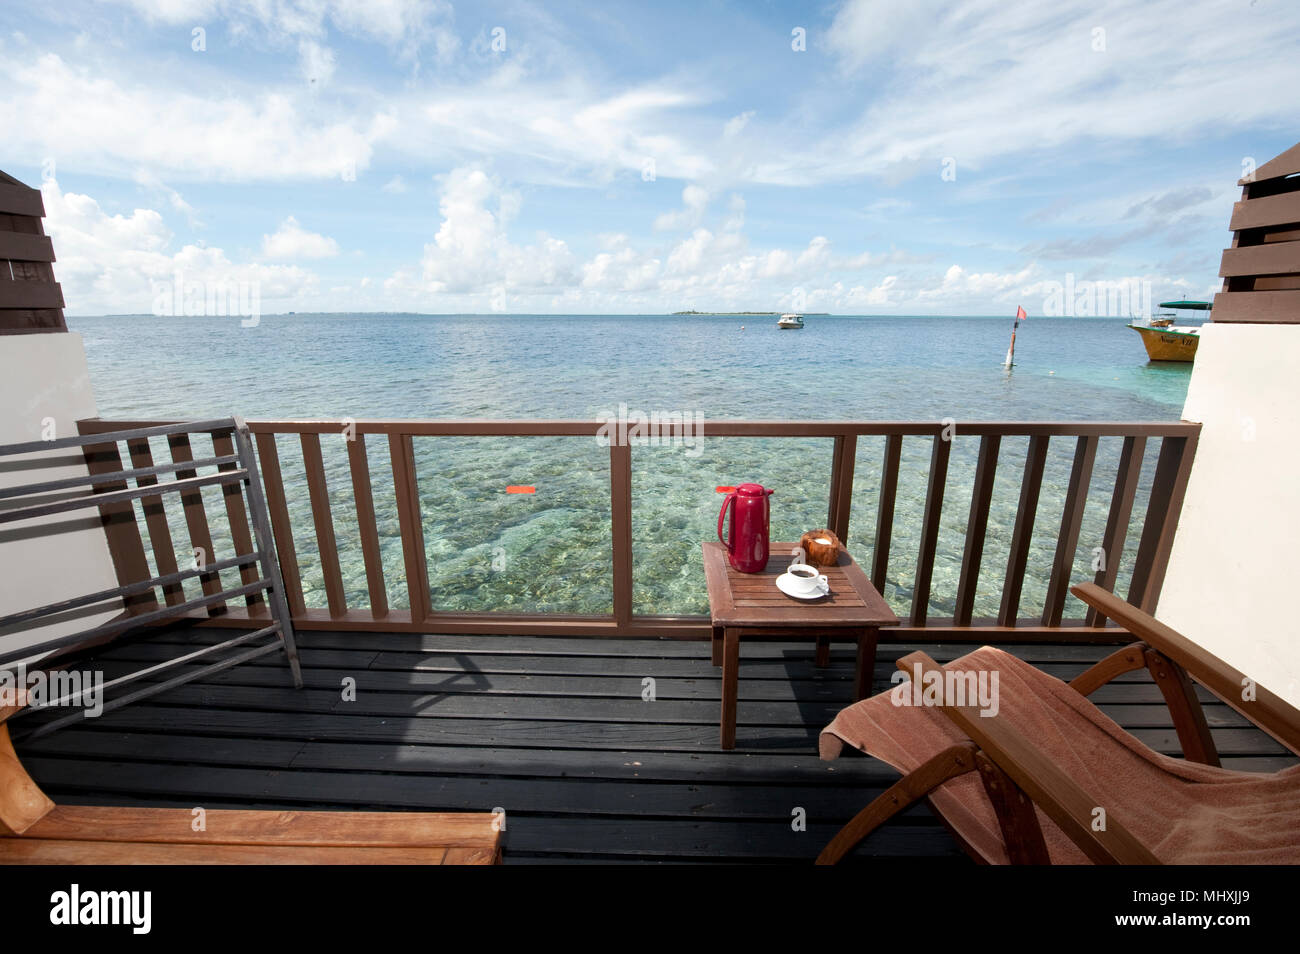 balcony view on tropic lagoon | Balkonblick auf tropische Lagune - Stock Image